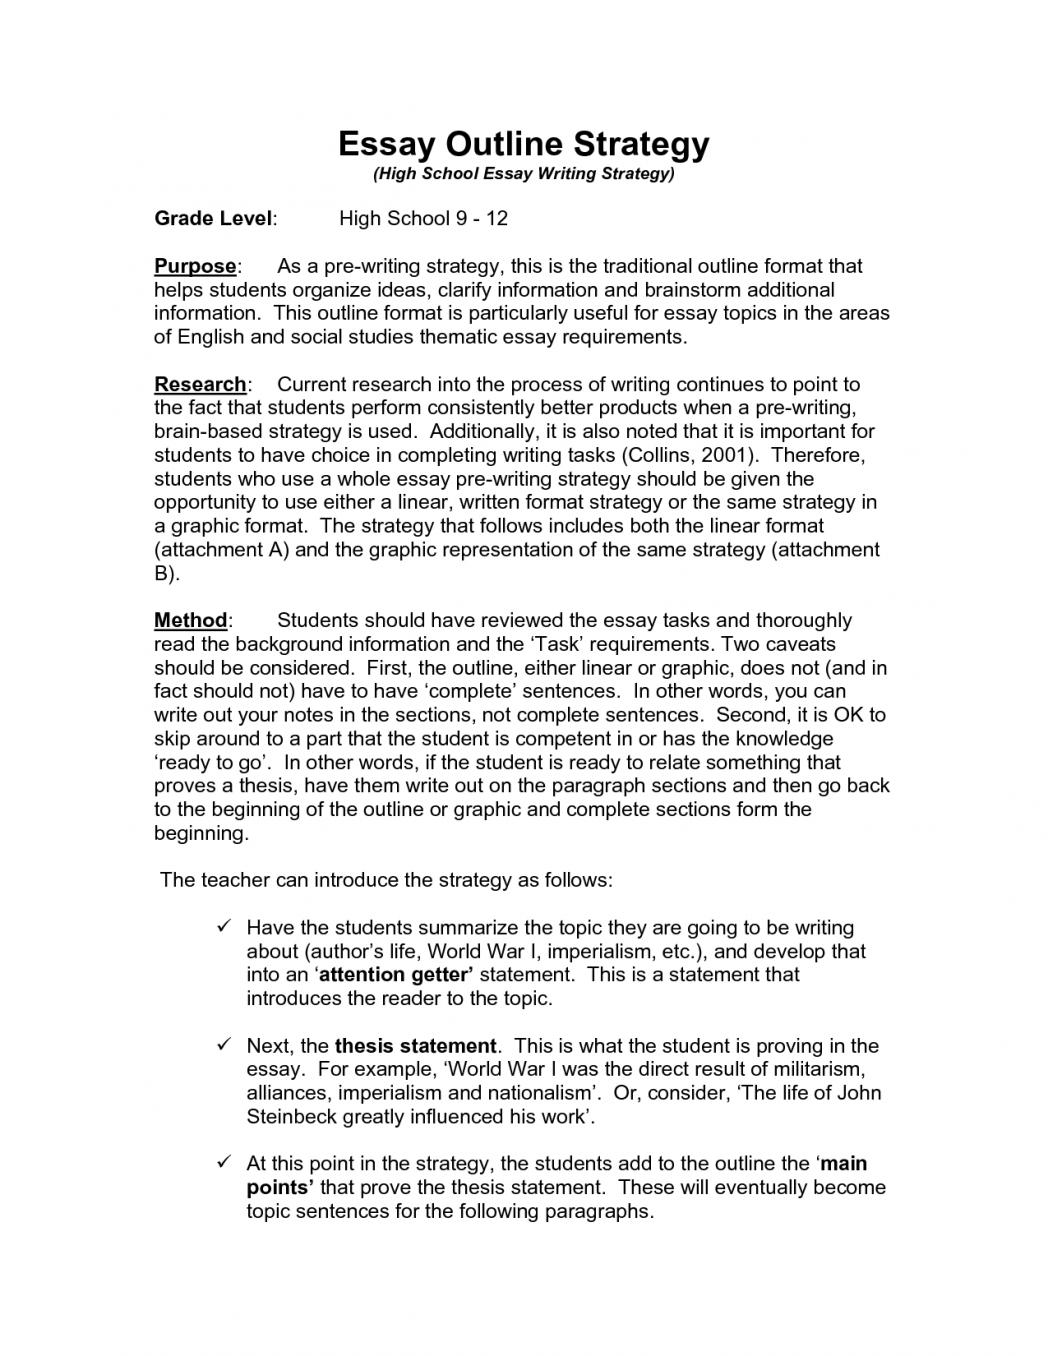 College vs high school essay